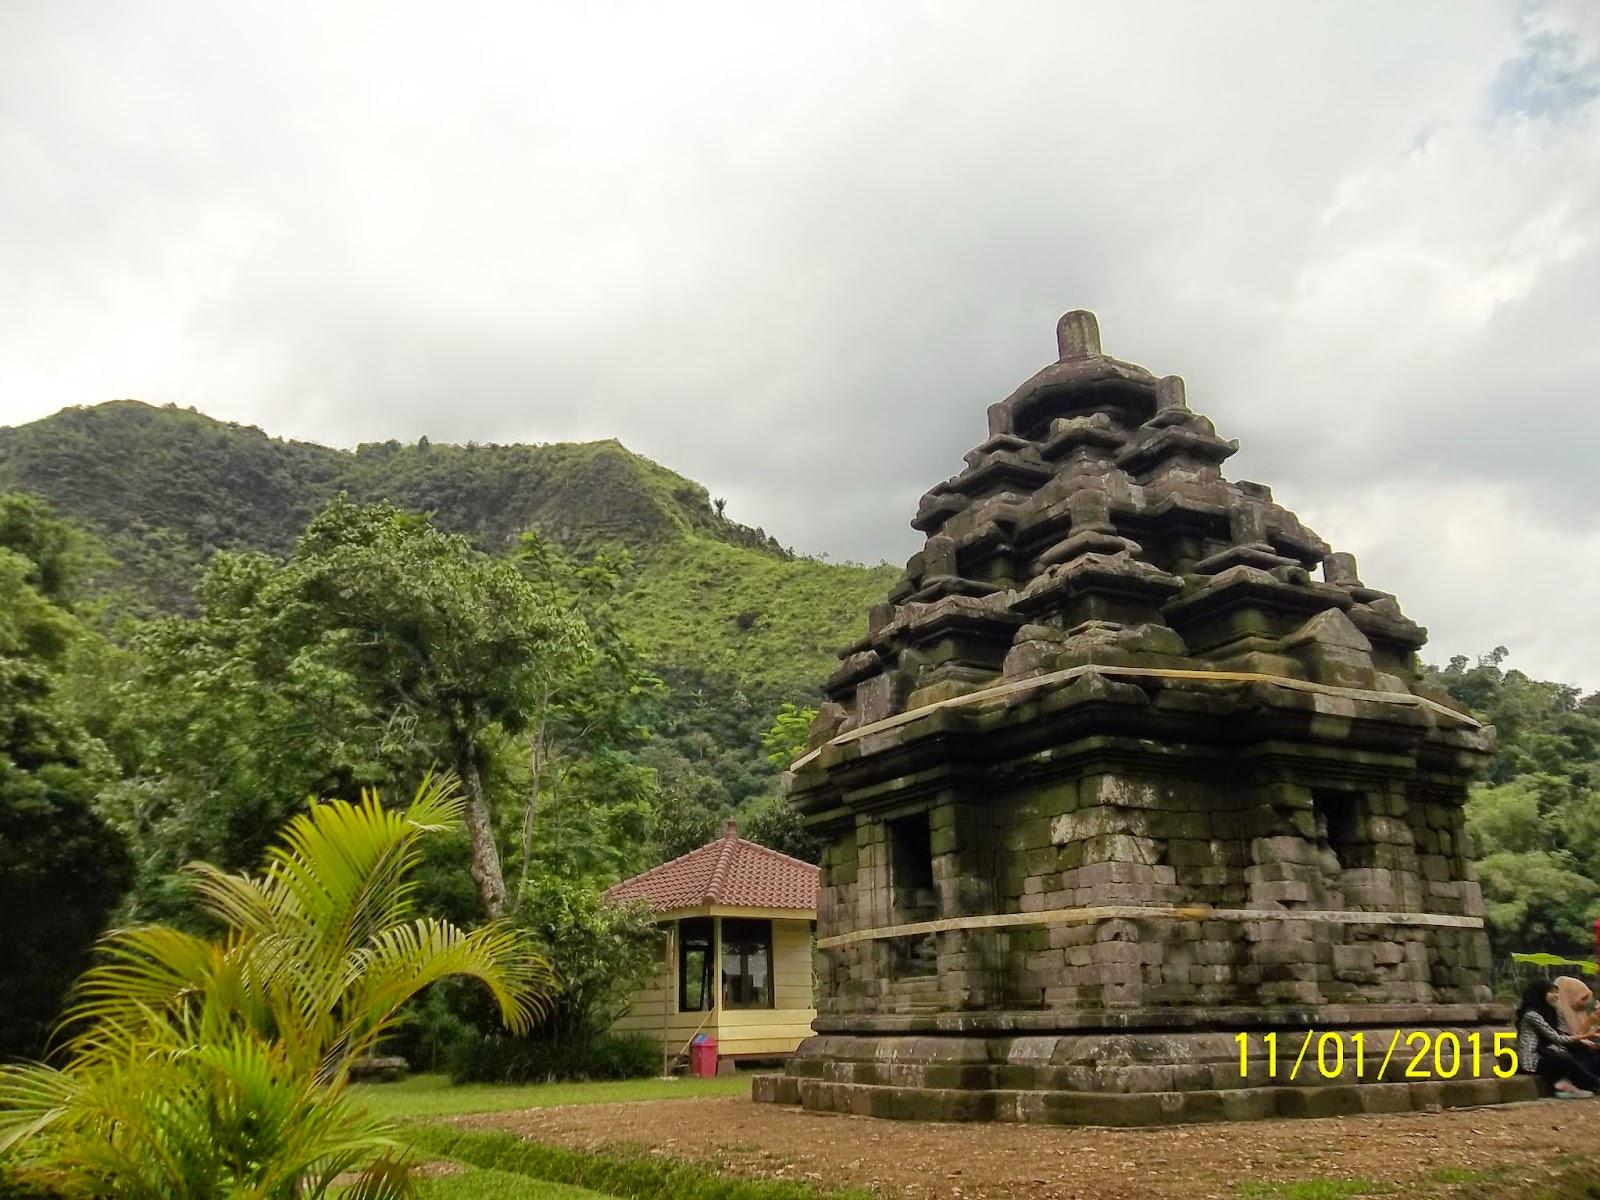 Blusukan Situs Candi Selogriyo Kab Magelang